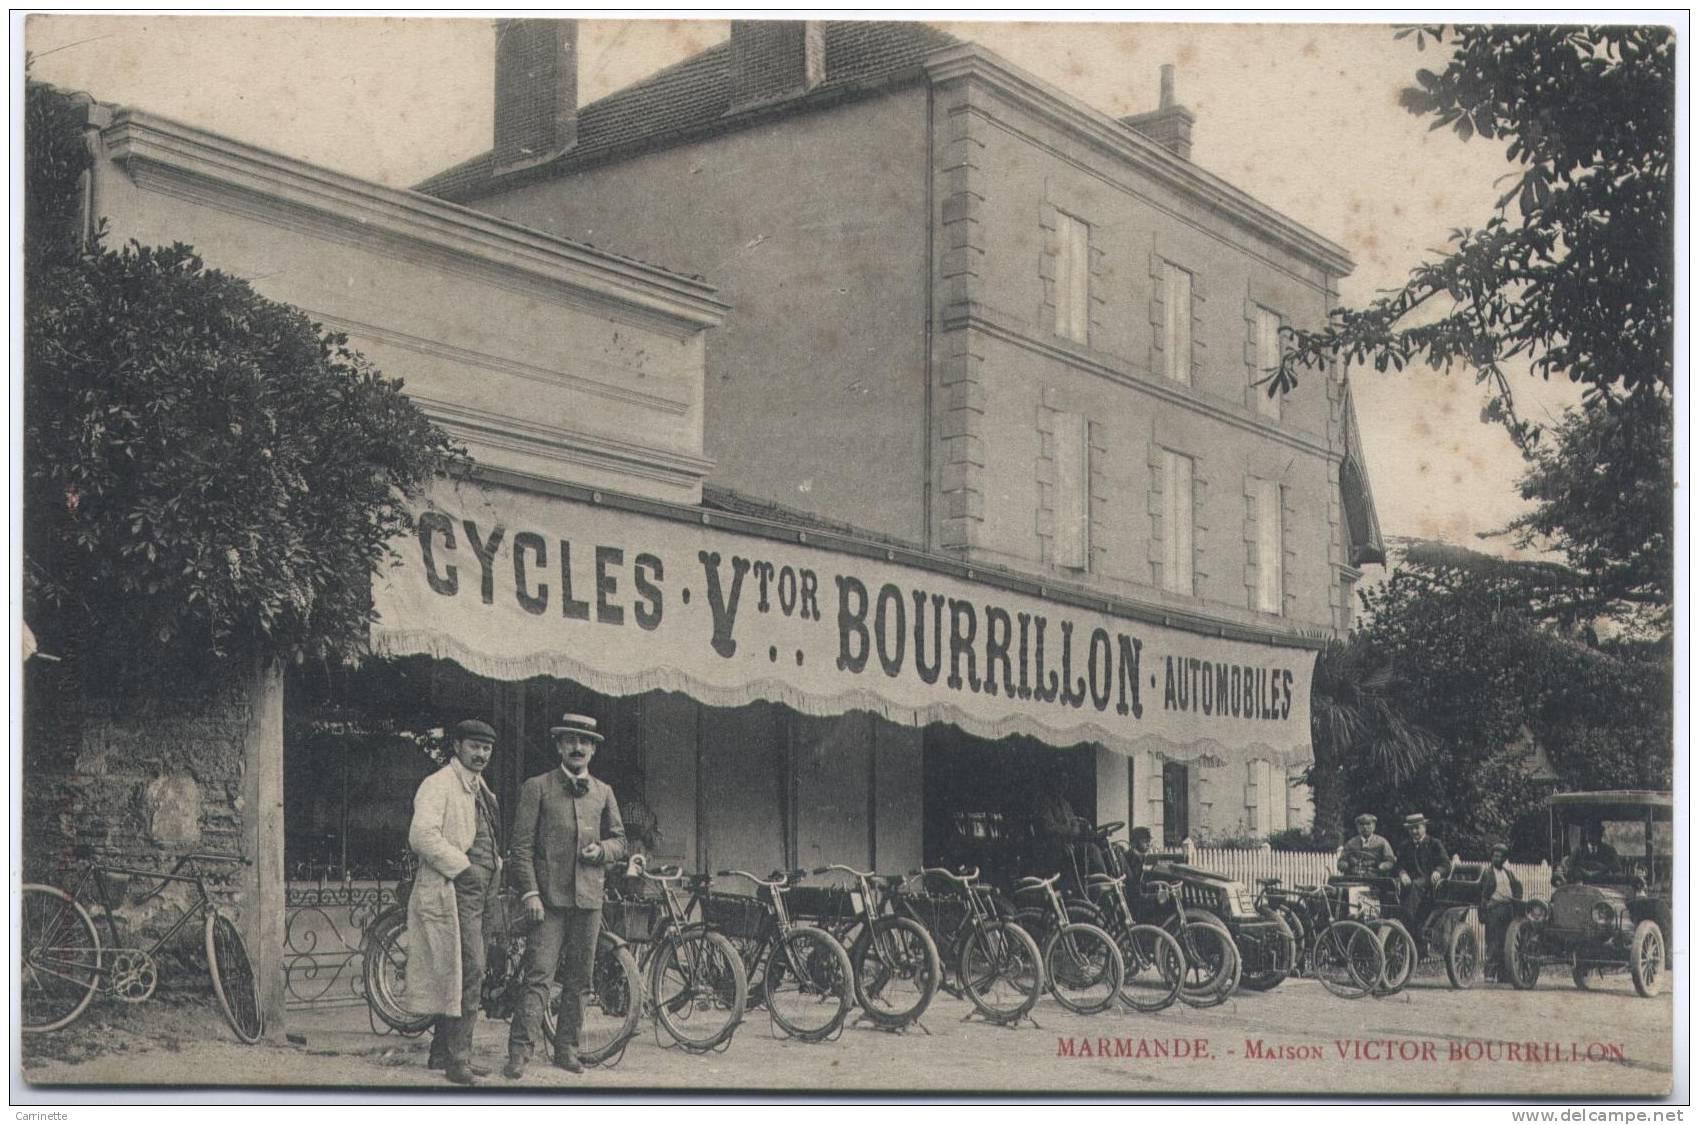 MARMANDE - 47 - Lot Et Garonne - Cycles Automobiles BOURRILLON - Marmande